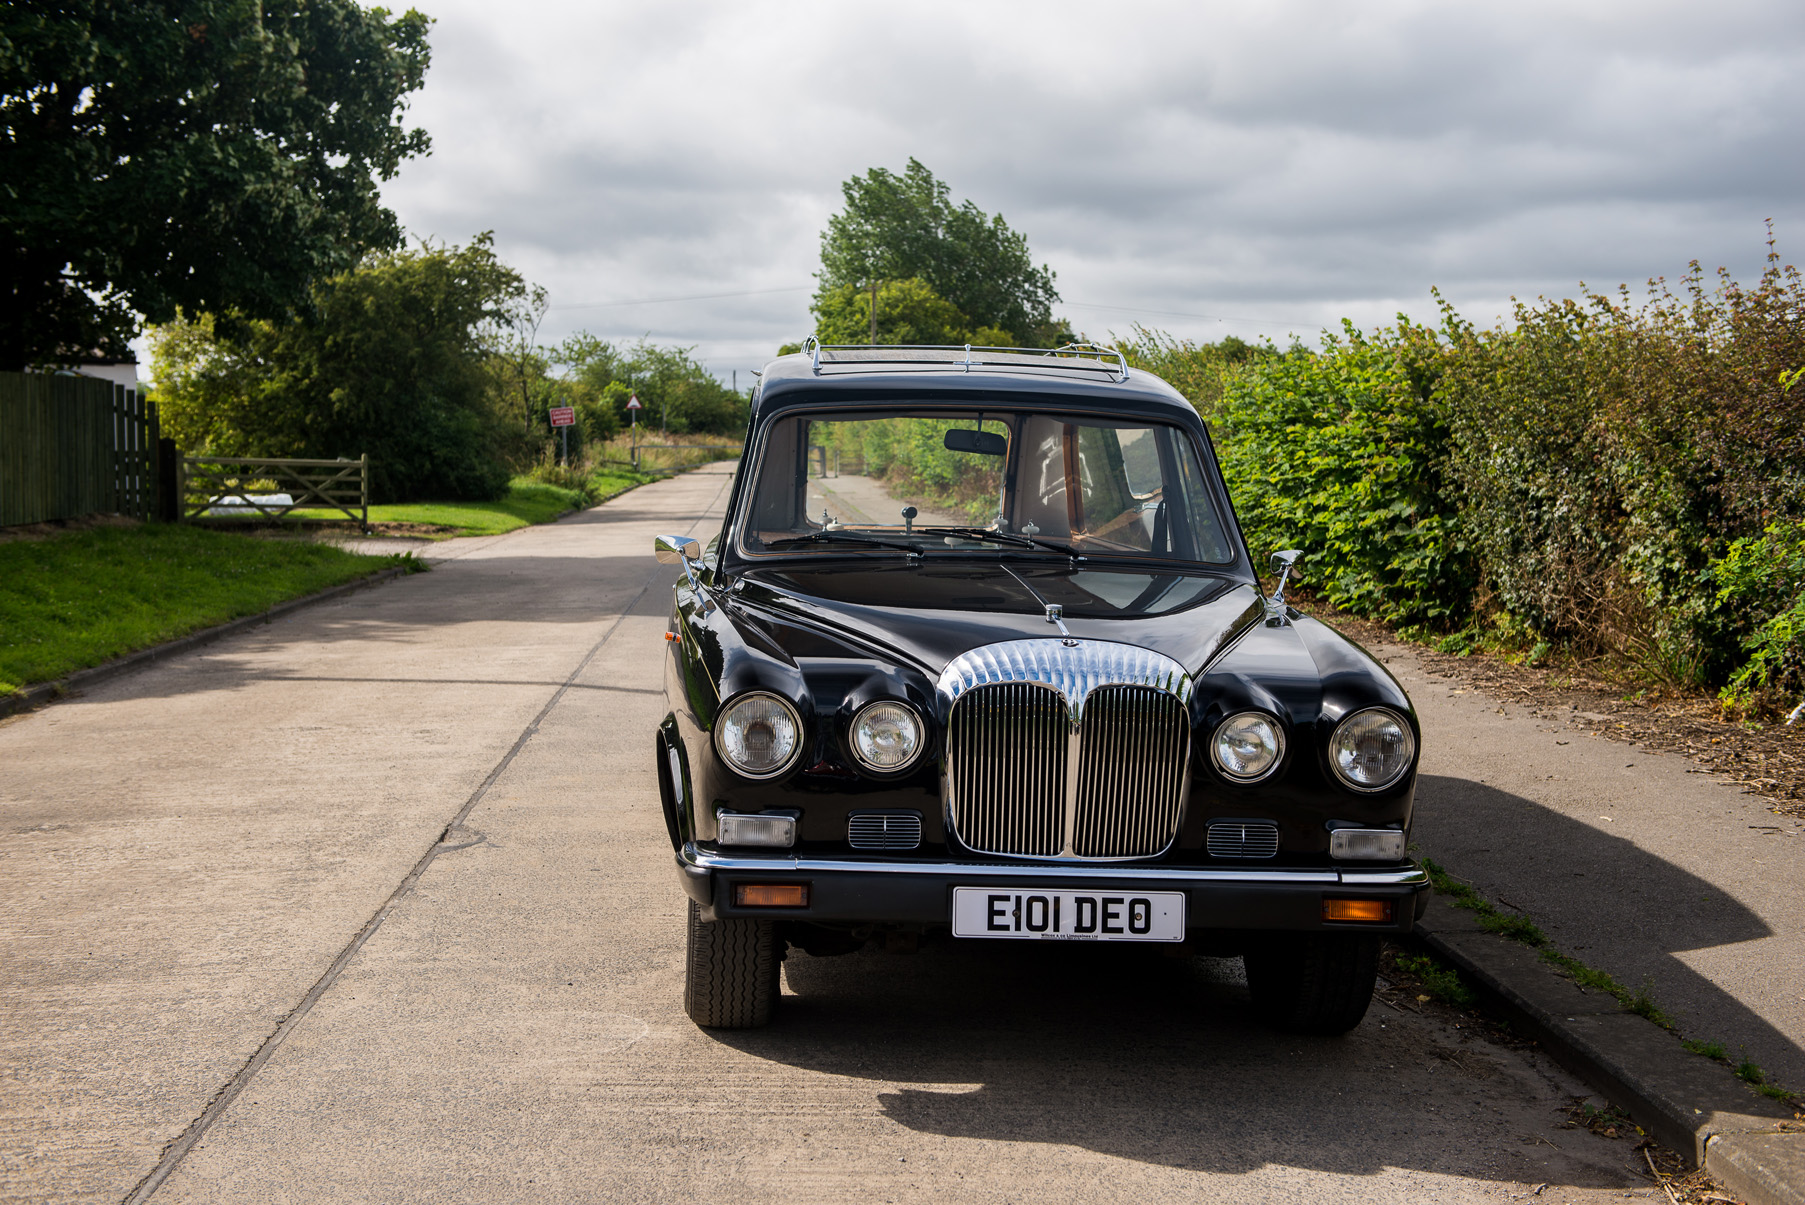 Classic black Jaguar hearse